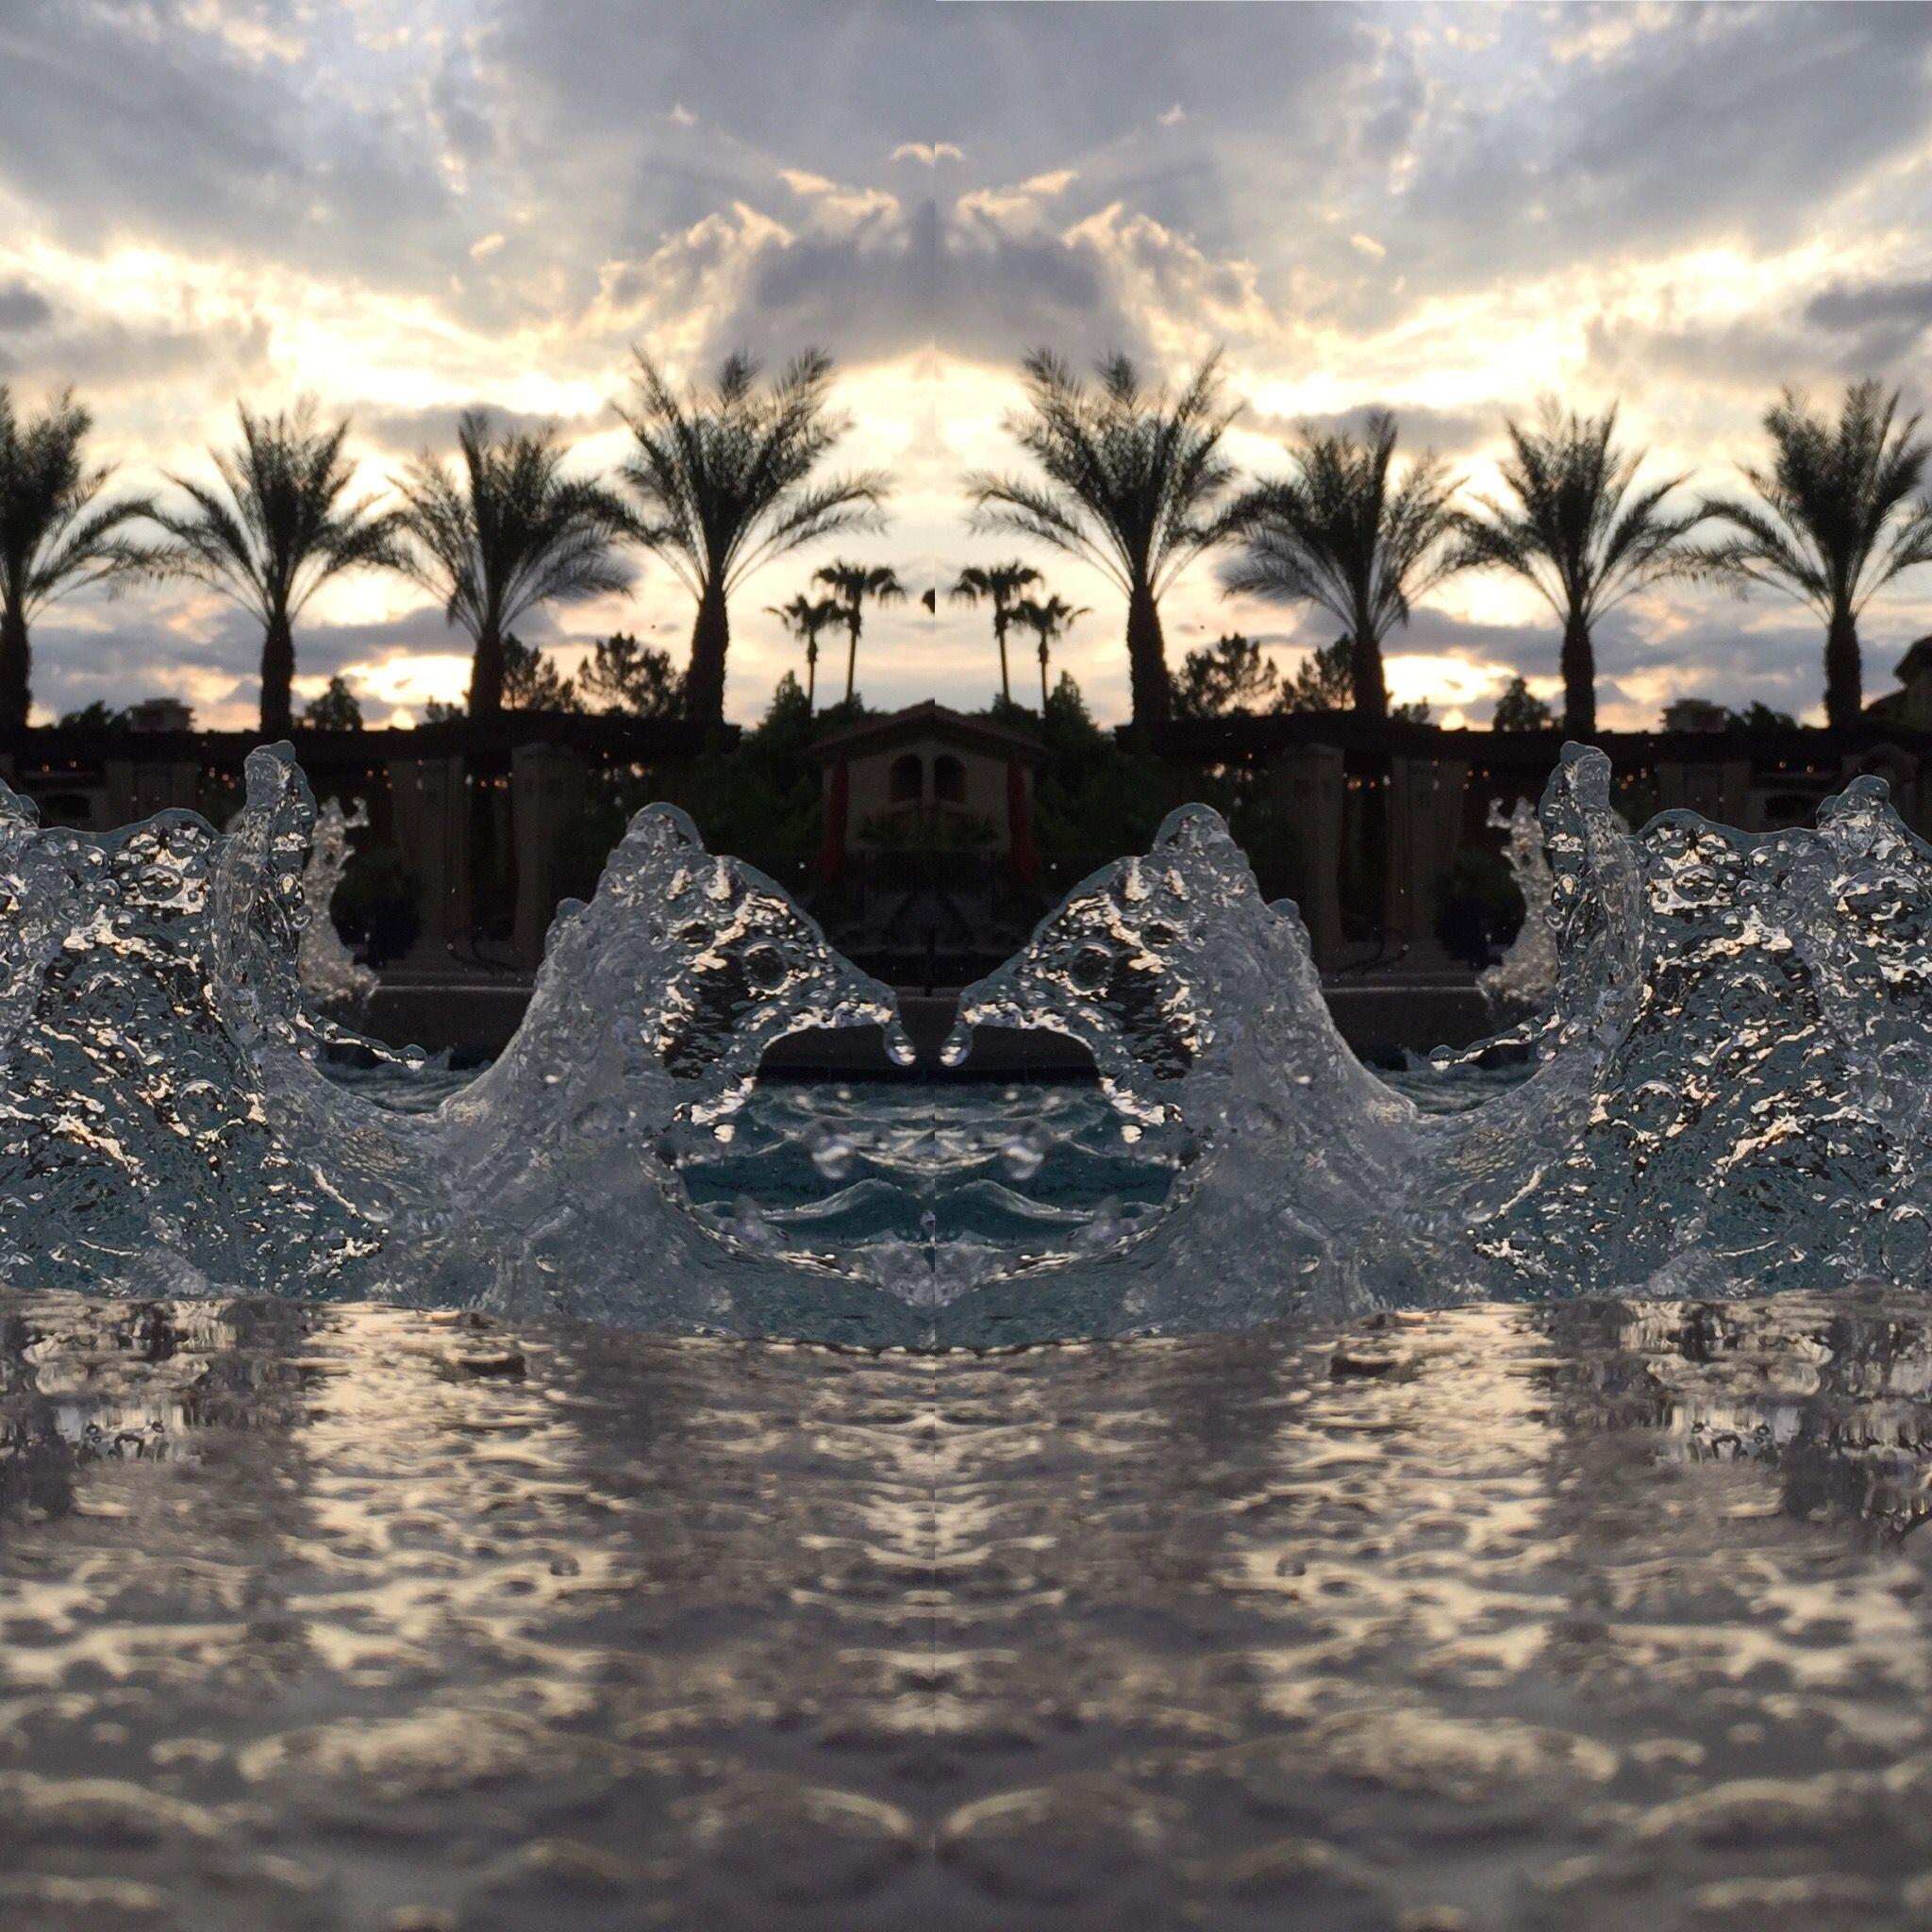 San Tropez Apartment Homes 2700 North Hayden Rd Scottsdale Az 85257 844 641 4106 Santropezlsg Nals Com Scottsdale Private Patio San